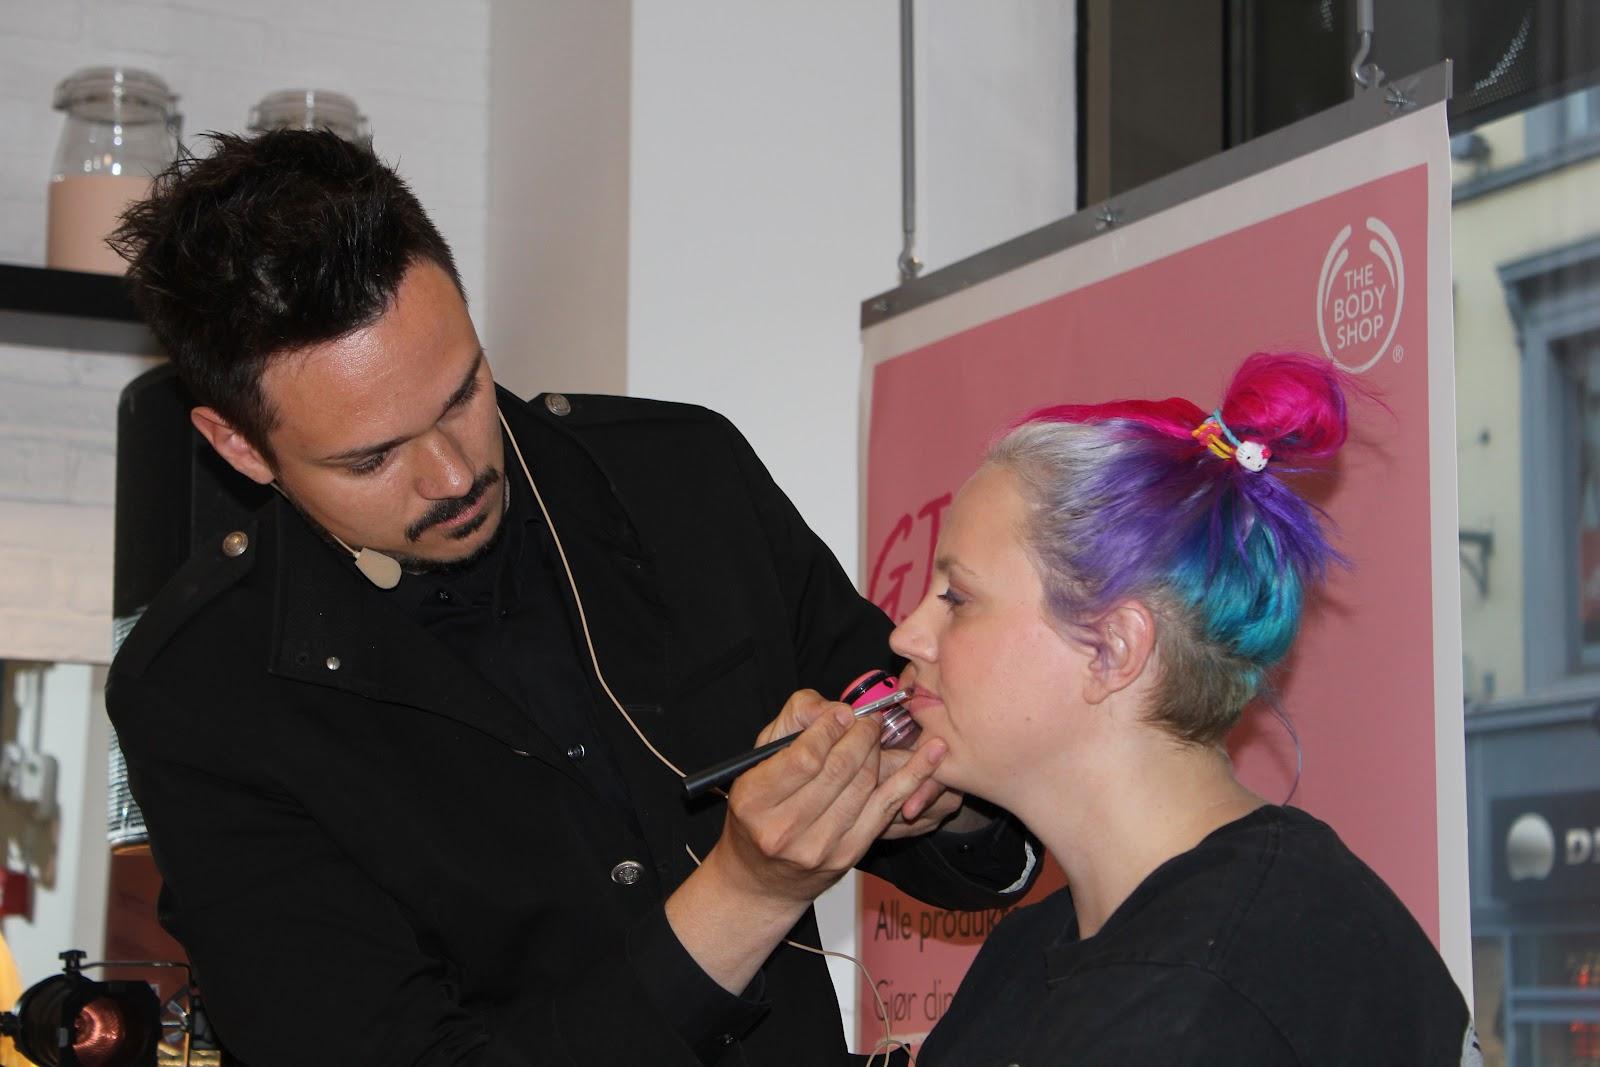 http://1.bp.blogspot.com/-Rb3AJjUtppI/T8--ASjWkaI/AAAAAAAAa00/xS24z9m239Q/s1600/Fam+Irvoll+og+Tore+petterson+Lily+Cole+Cruelty+Free+The+Body+Shop+Shoppingkveld+Costume.jpg